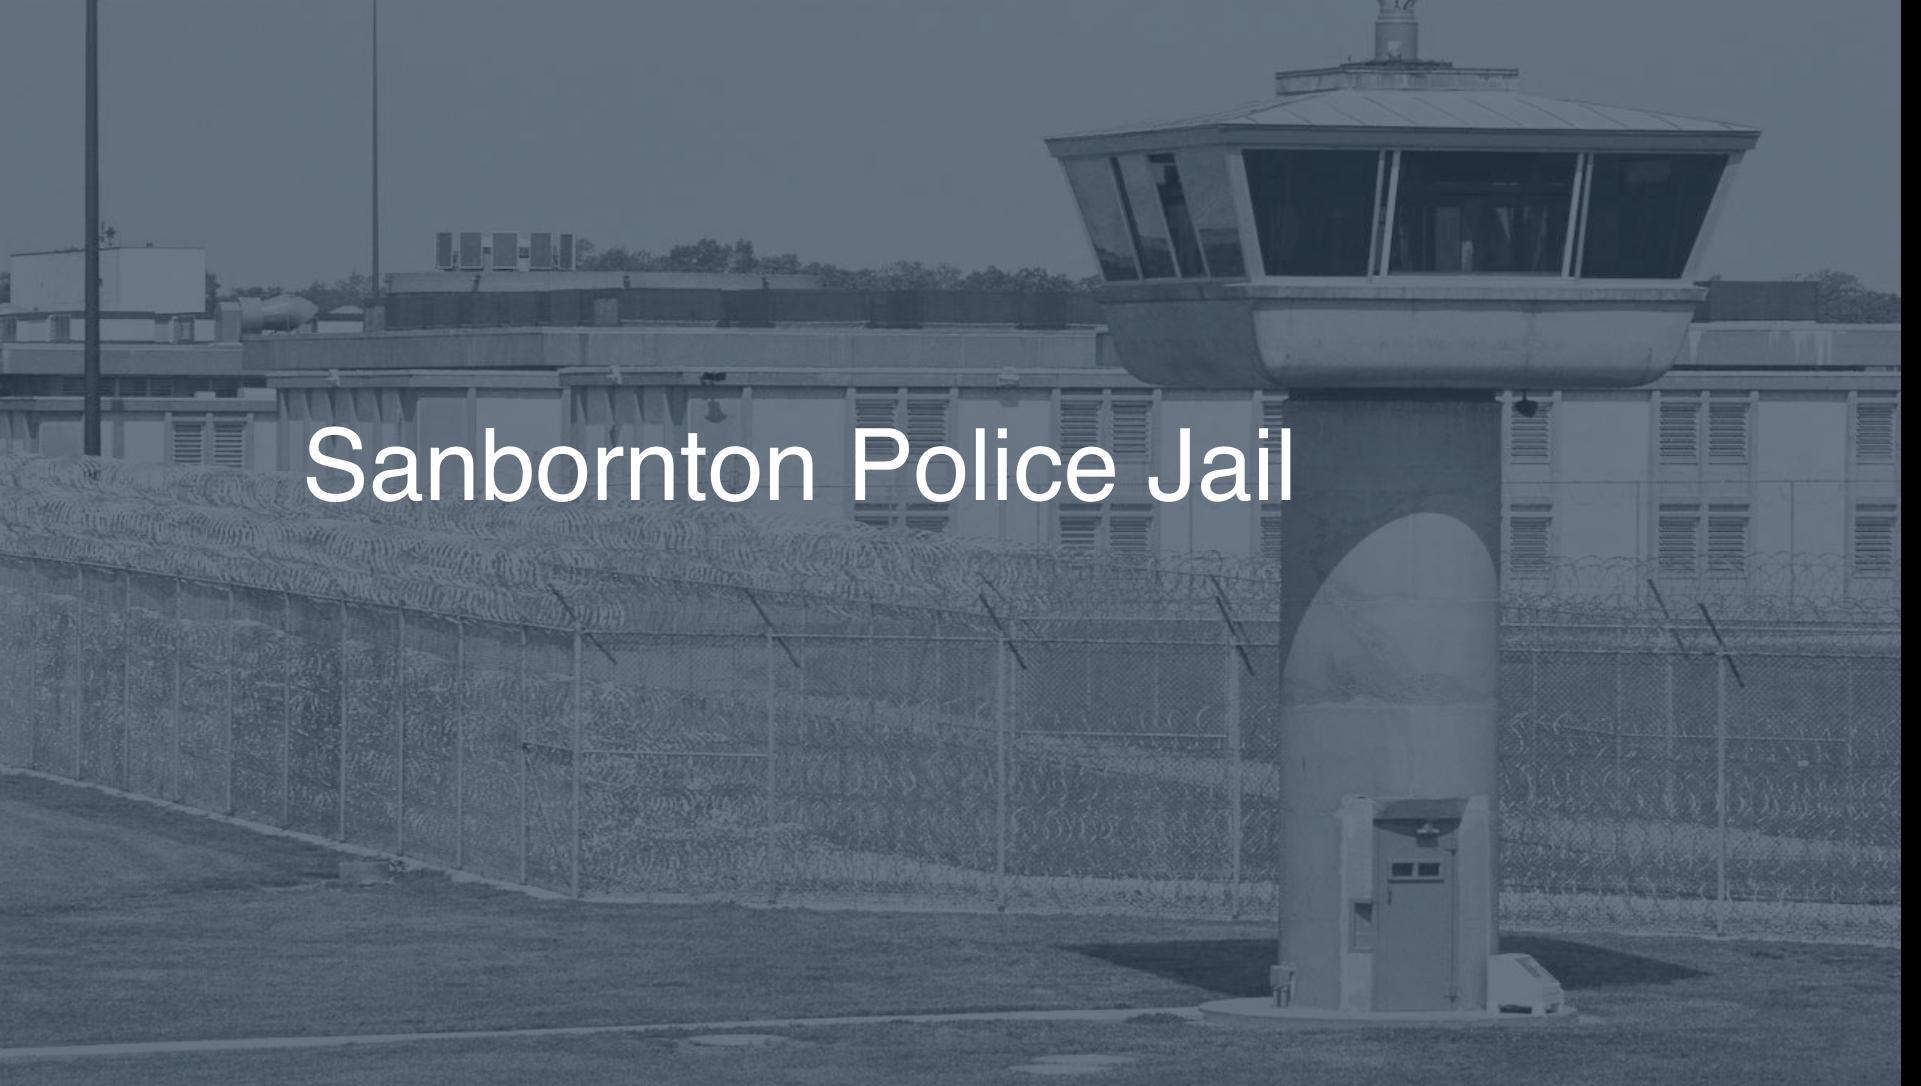 Sanbornton Police Jail correctional facility picture